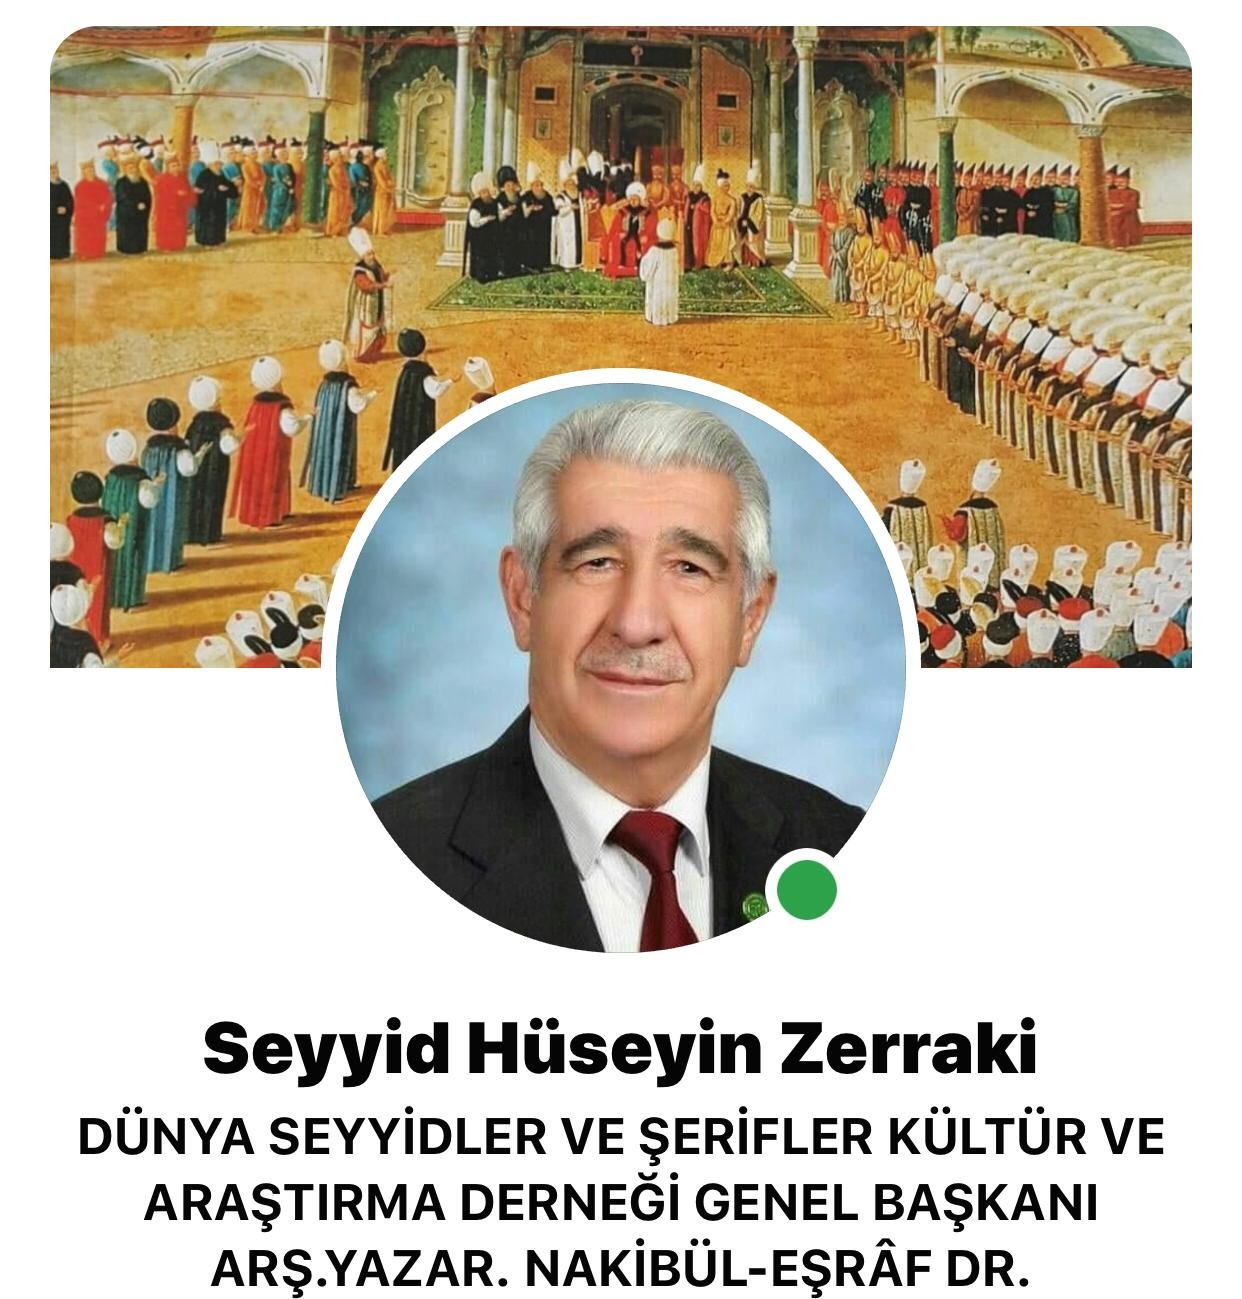 OZybwZ